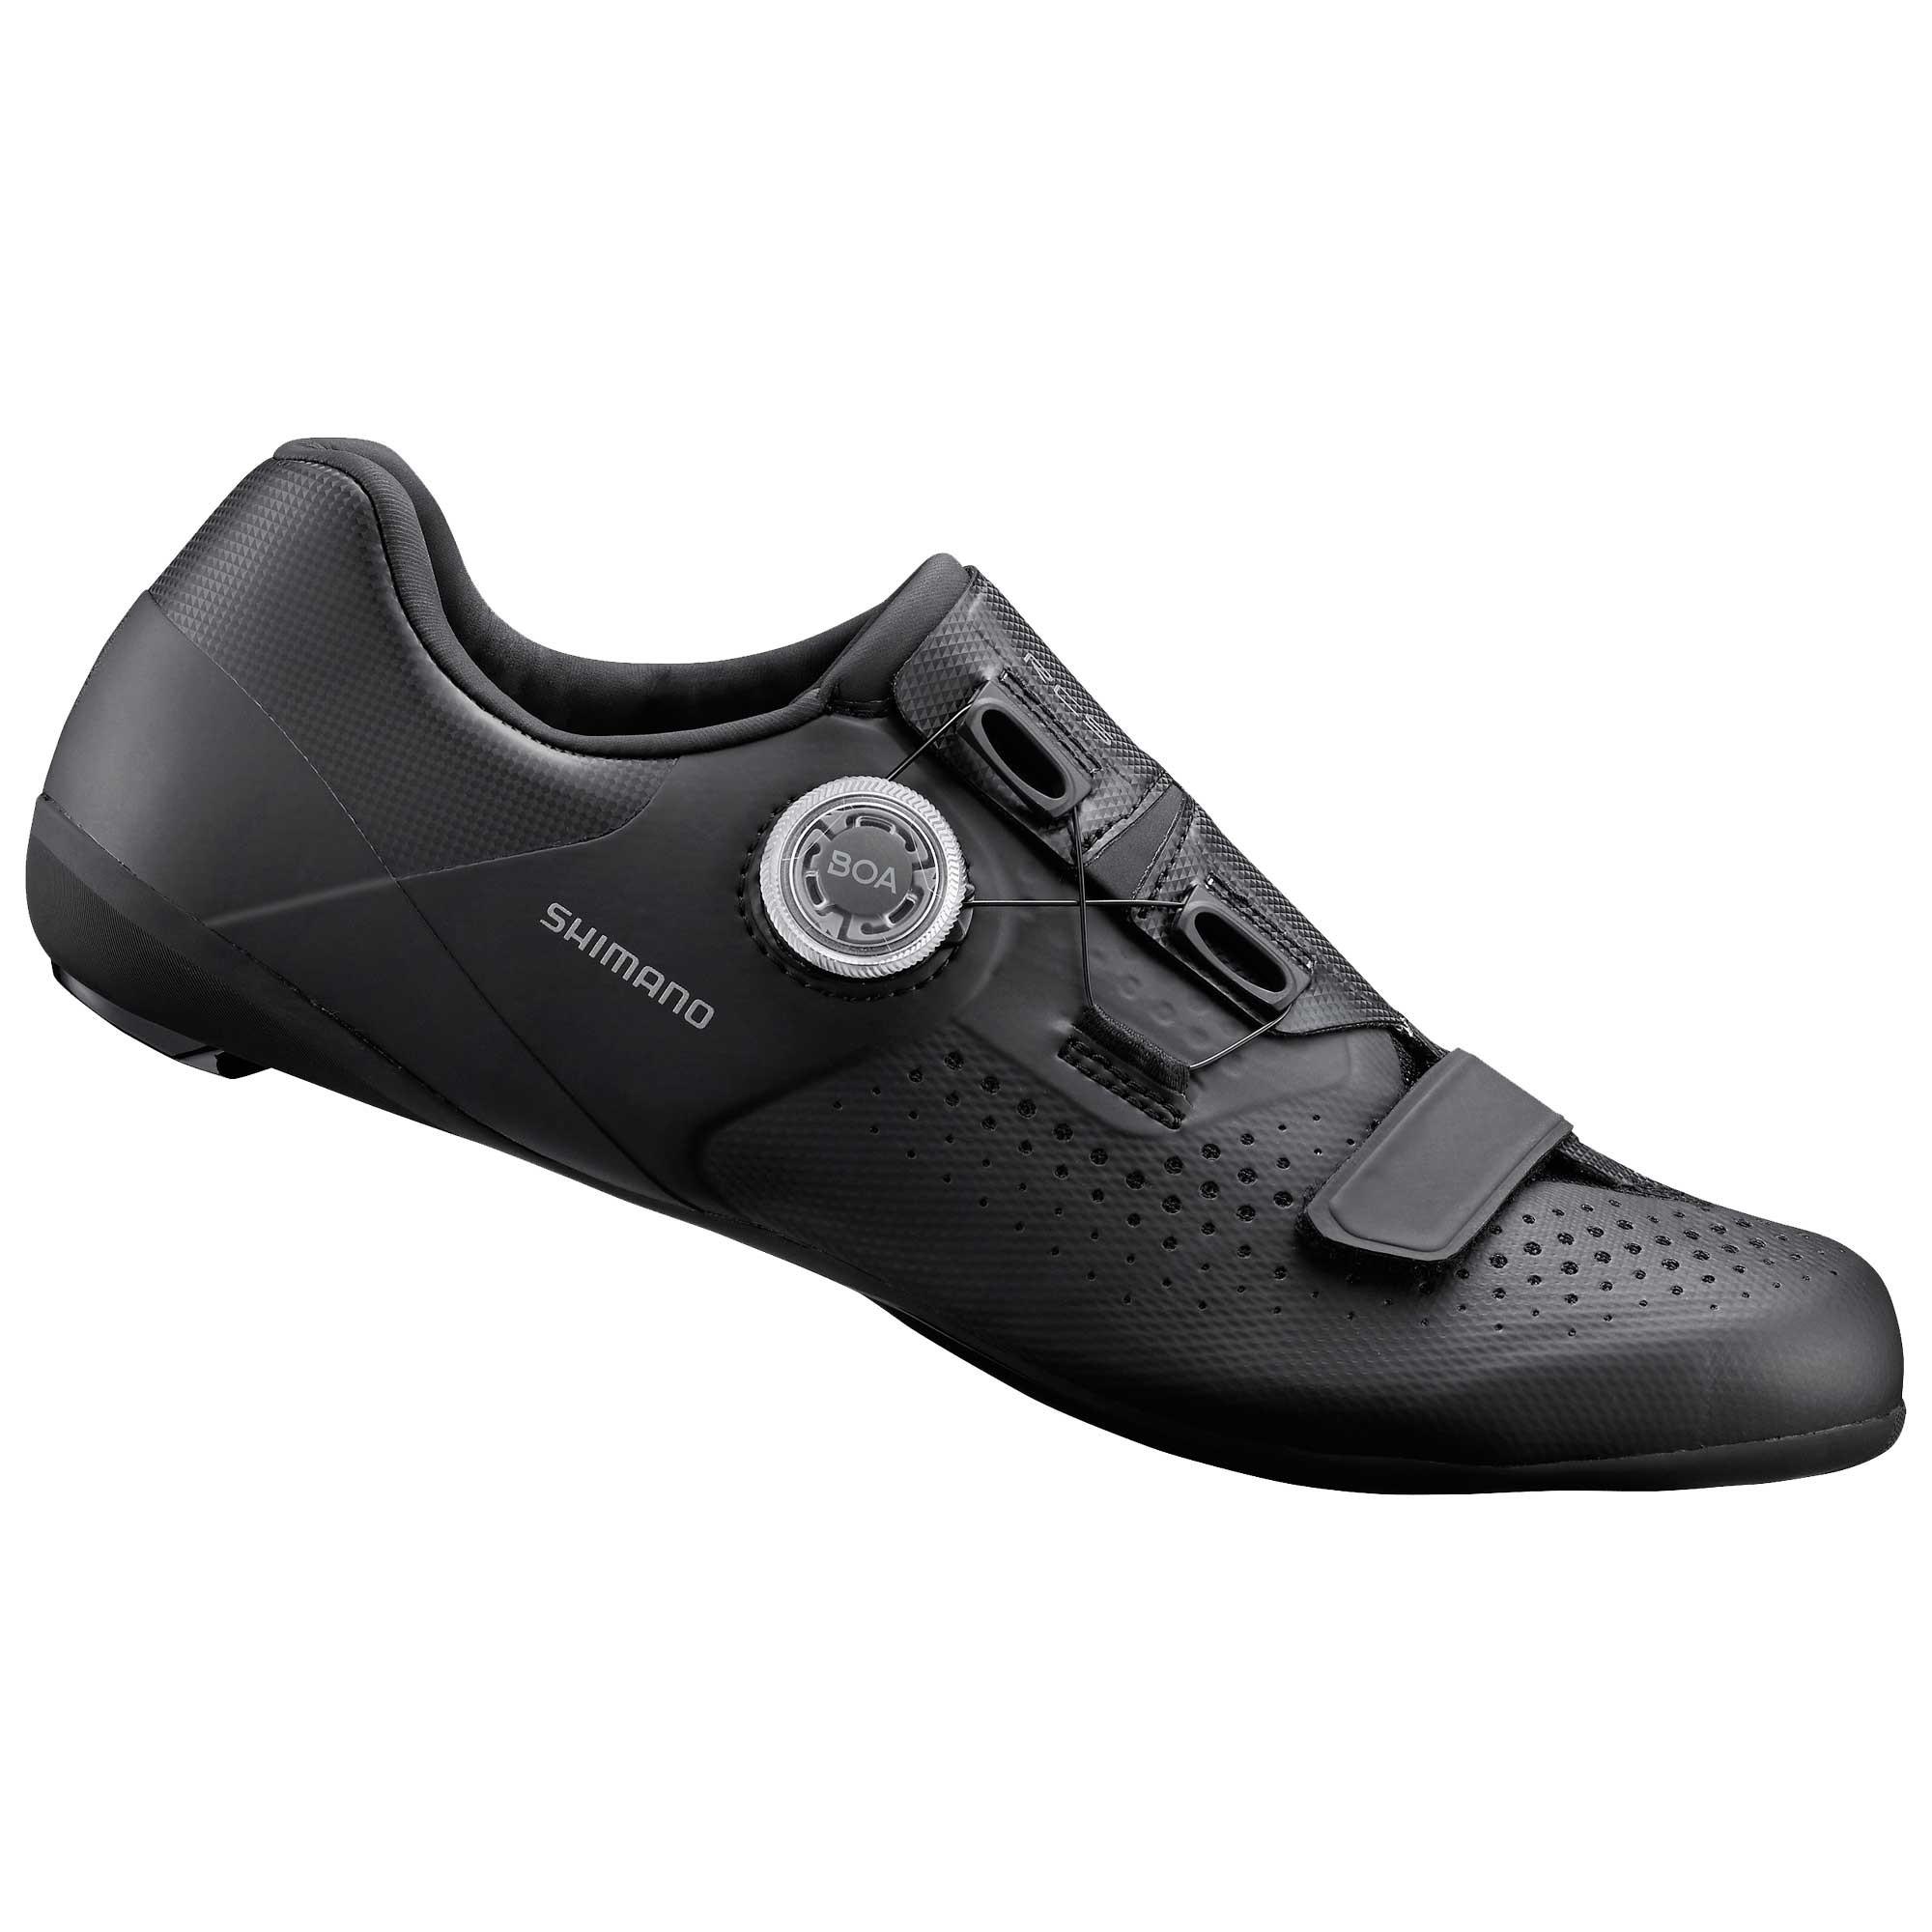 Shimano RC5 SPD-SL Road Cycling Shoes